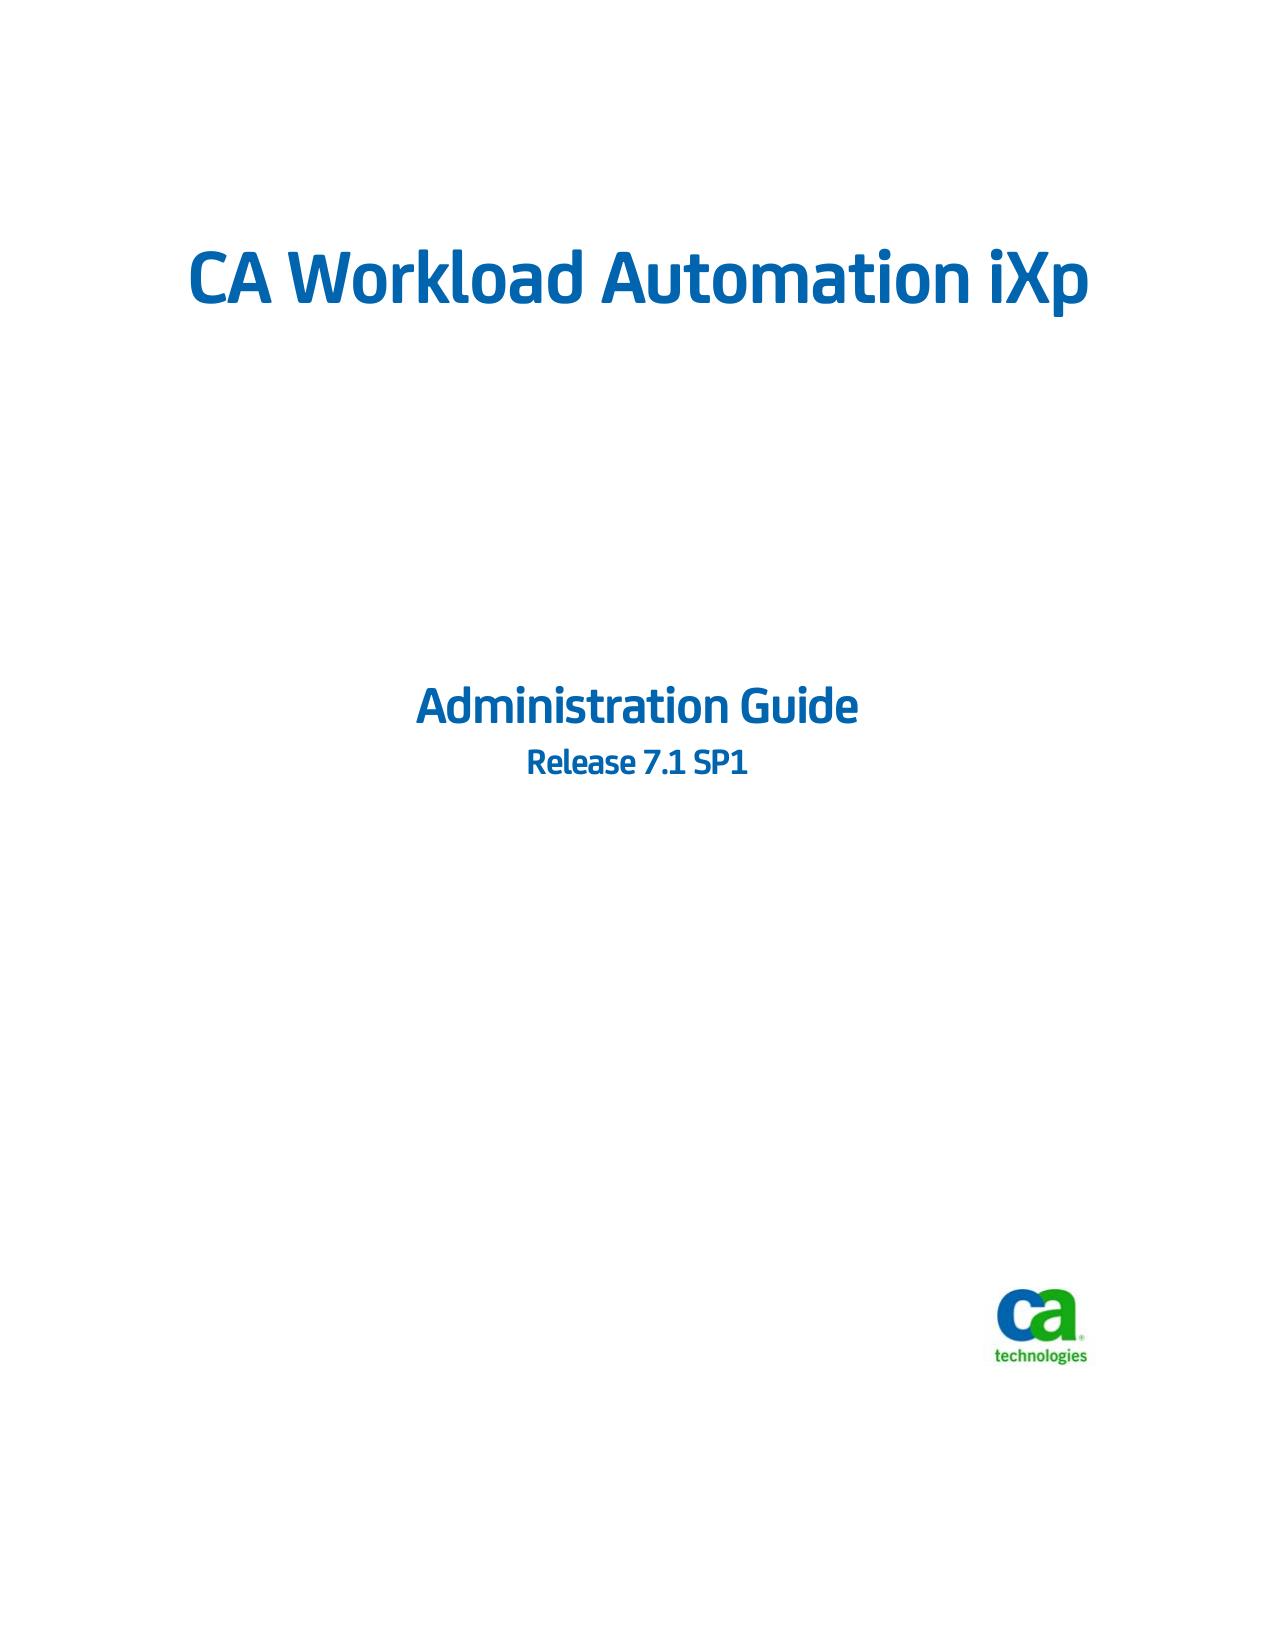 CA Workload Automation iXp Admin Guide | manualzz com